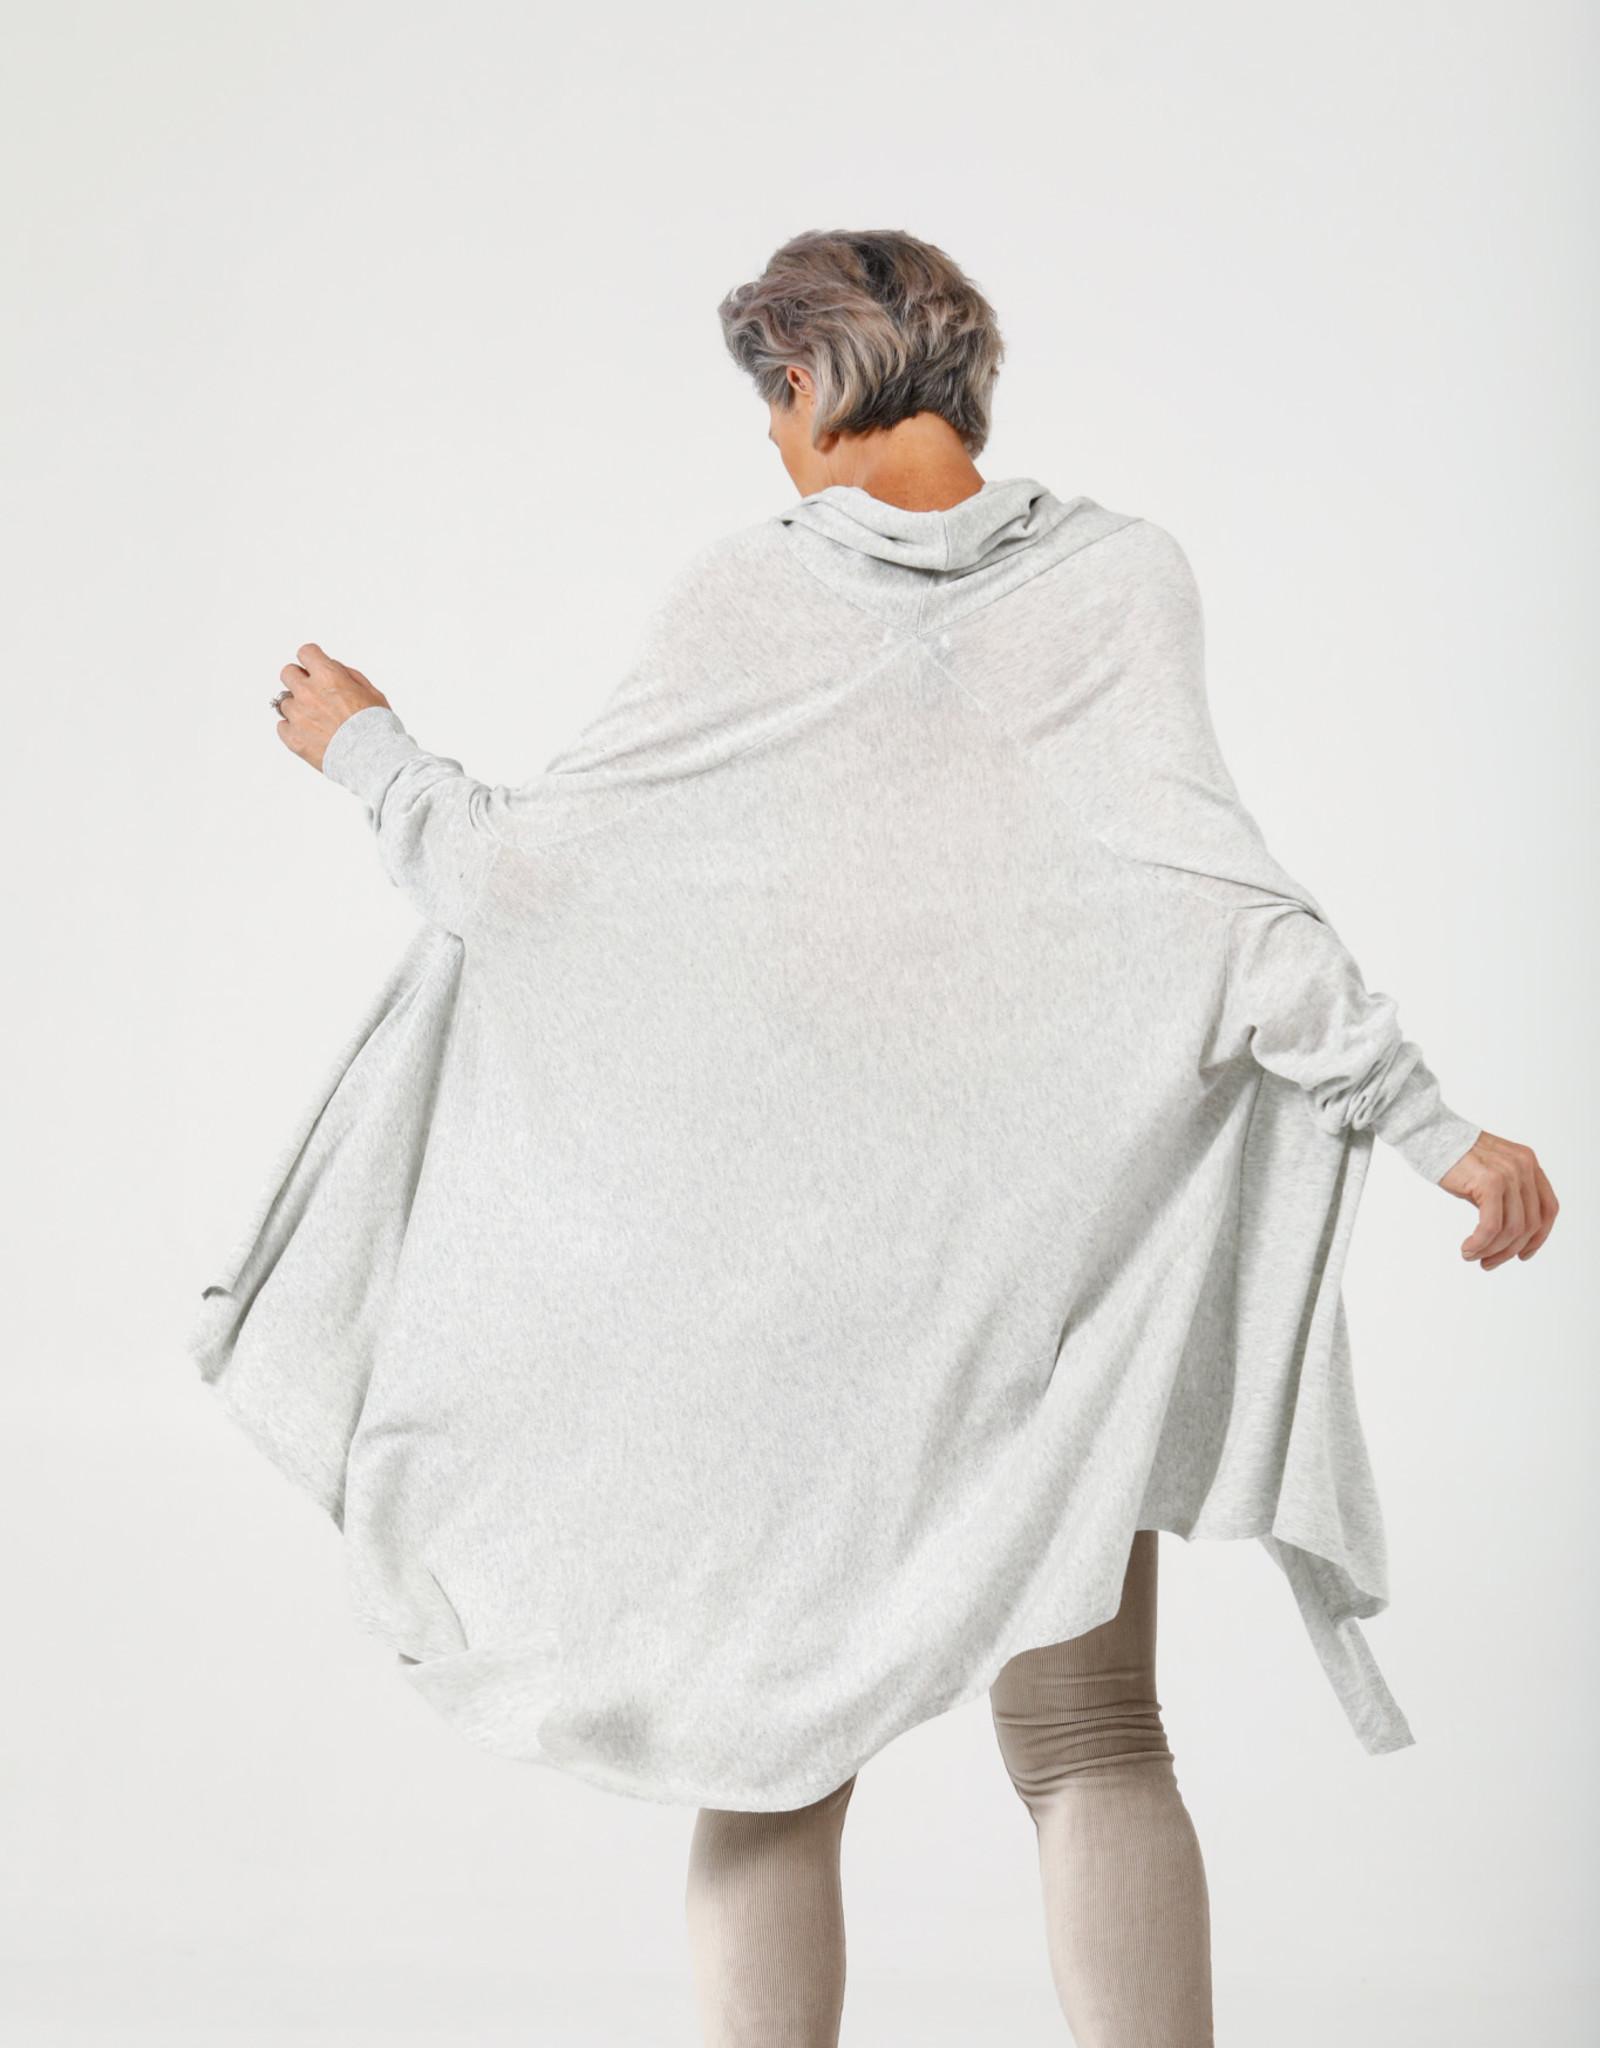 Brave & True Brave & True - Brittany Knit (Marble Grey) BT5687